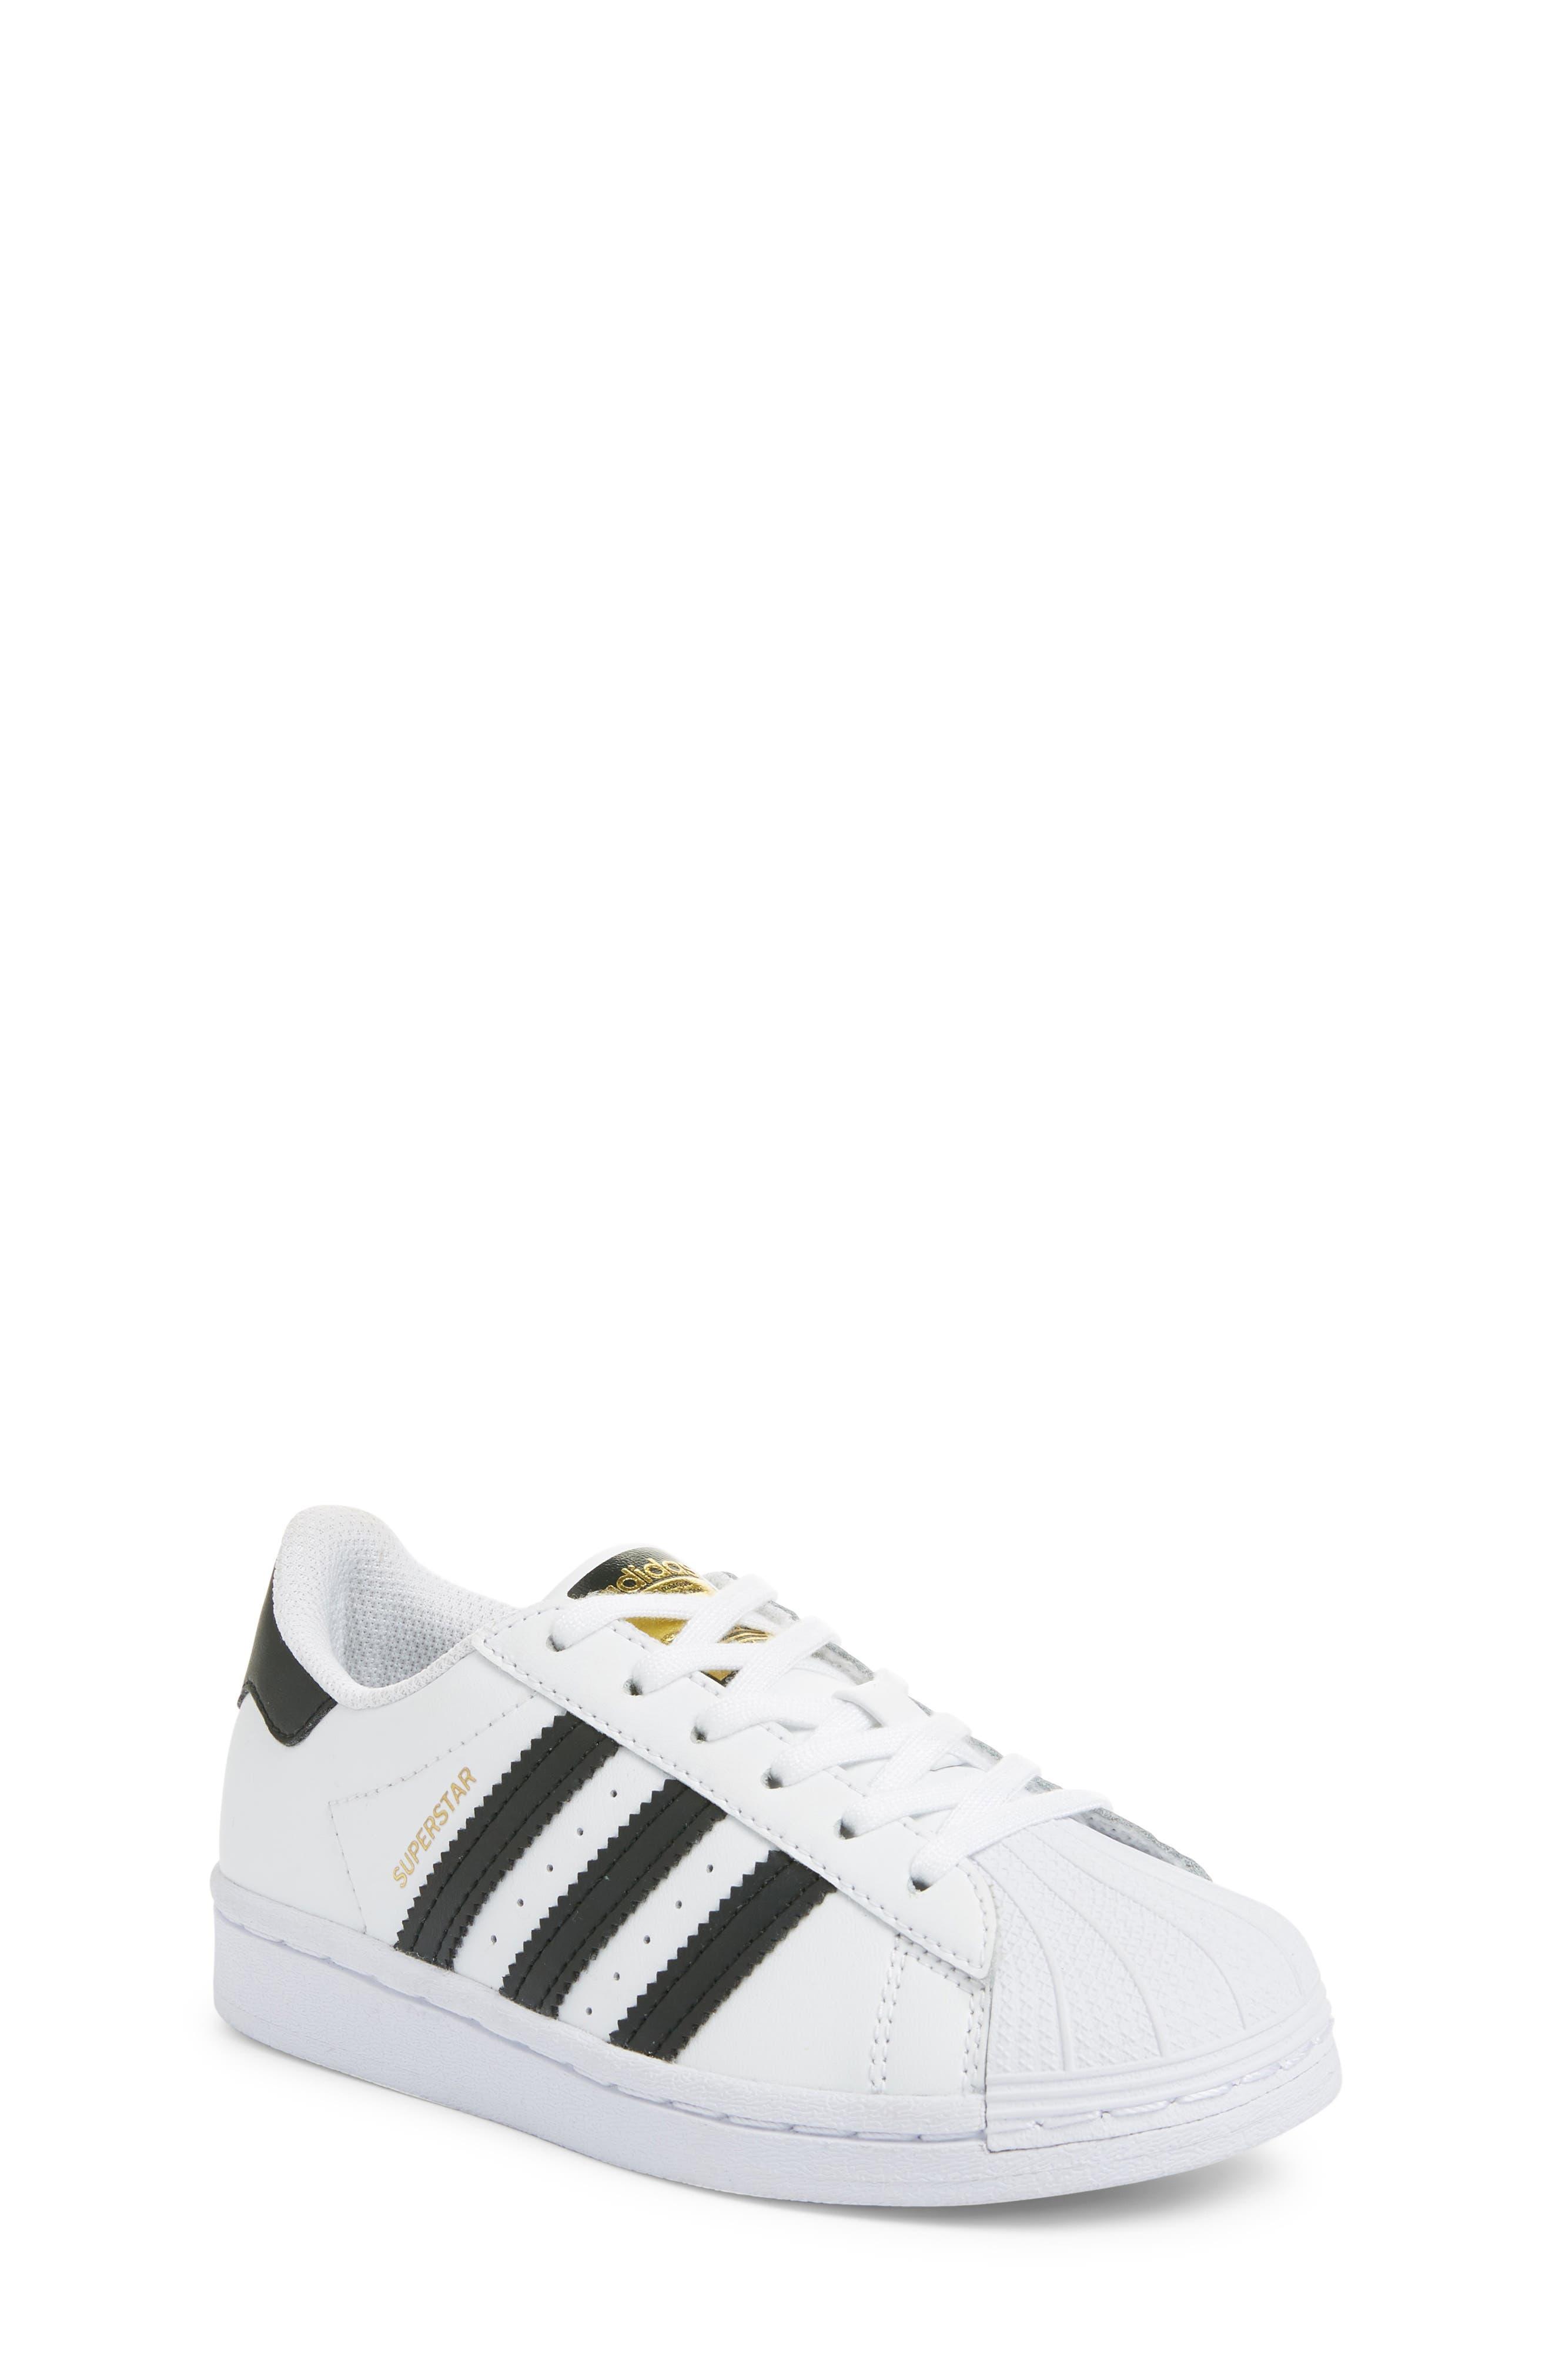 Brash 177197 Sneakers Big Kid Junior Girls Shoes Sz:4 New With Box